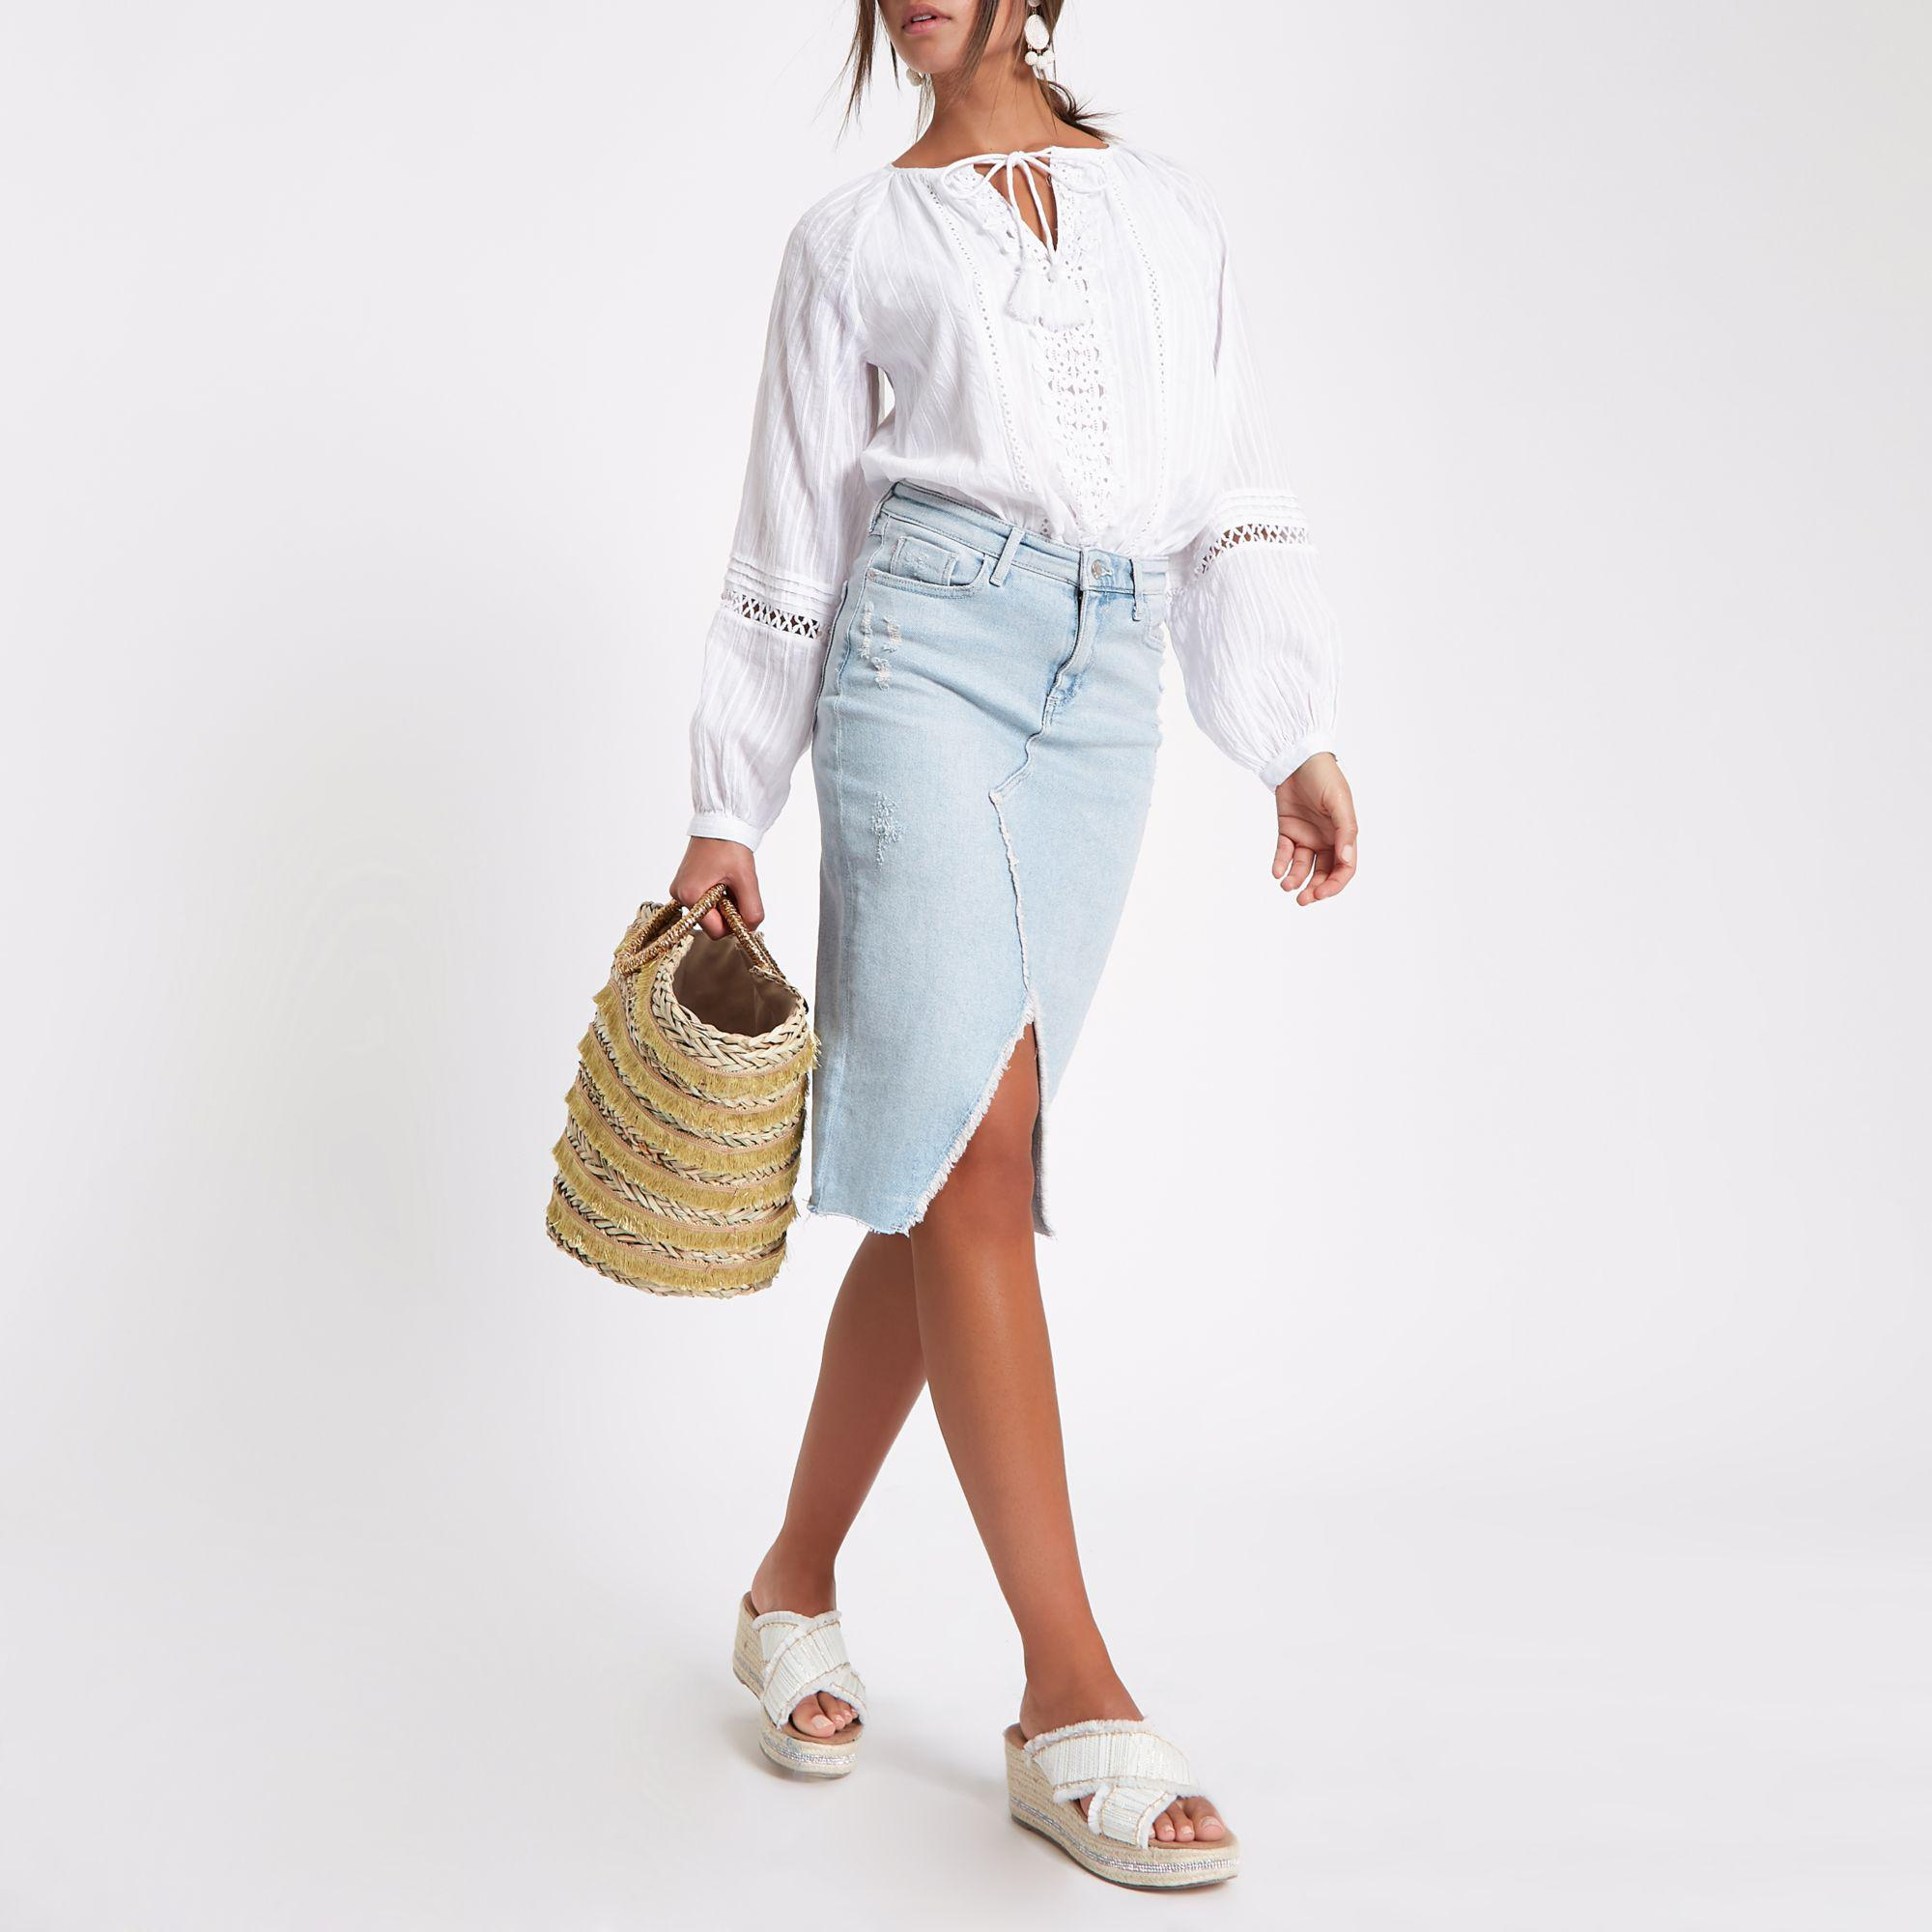 d042057a3f Amazon.com: pencil skirt light blue: Clothing, Shoes & Jewelry